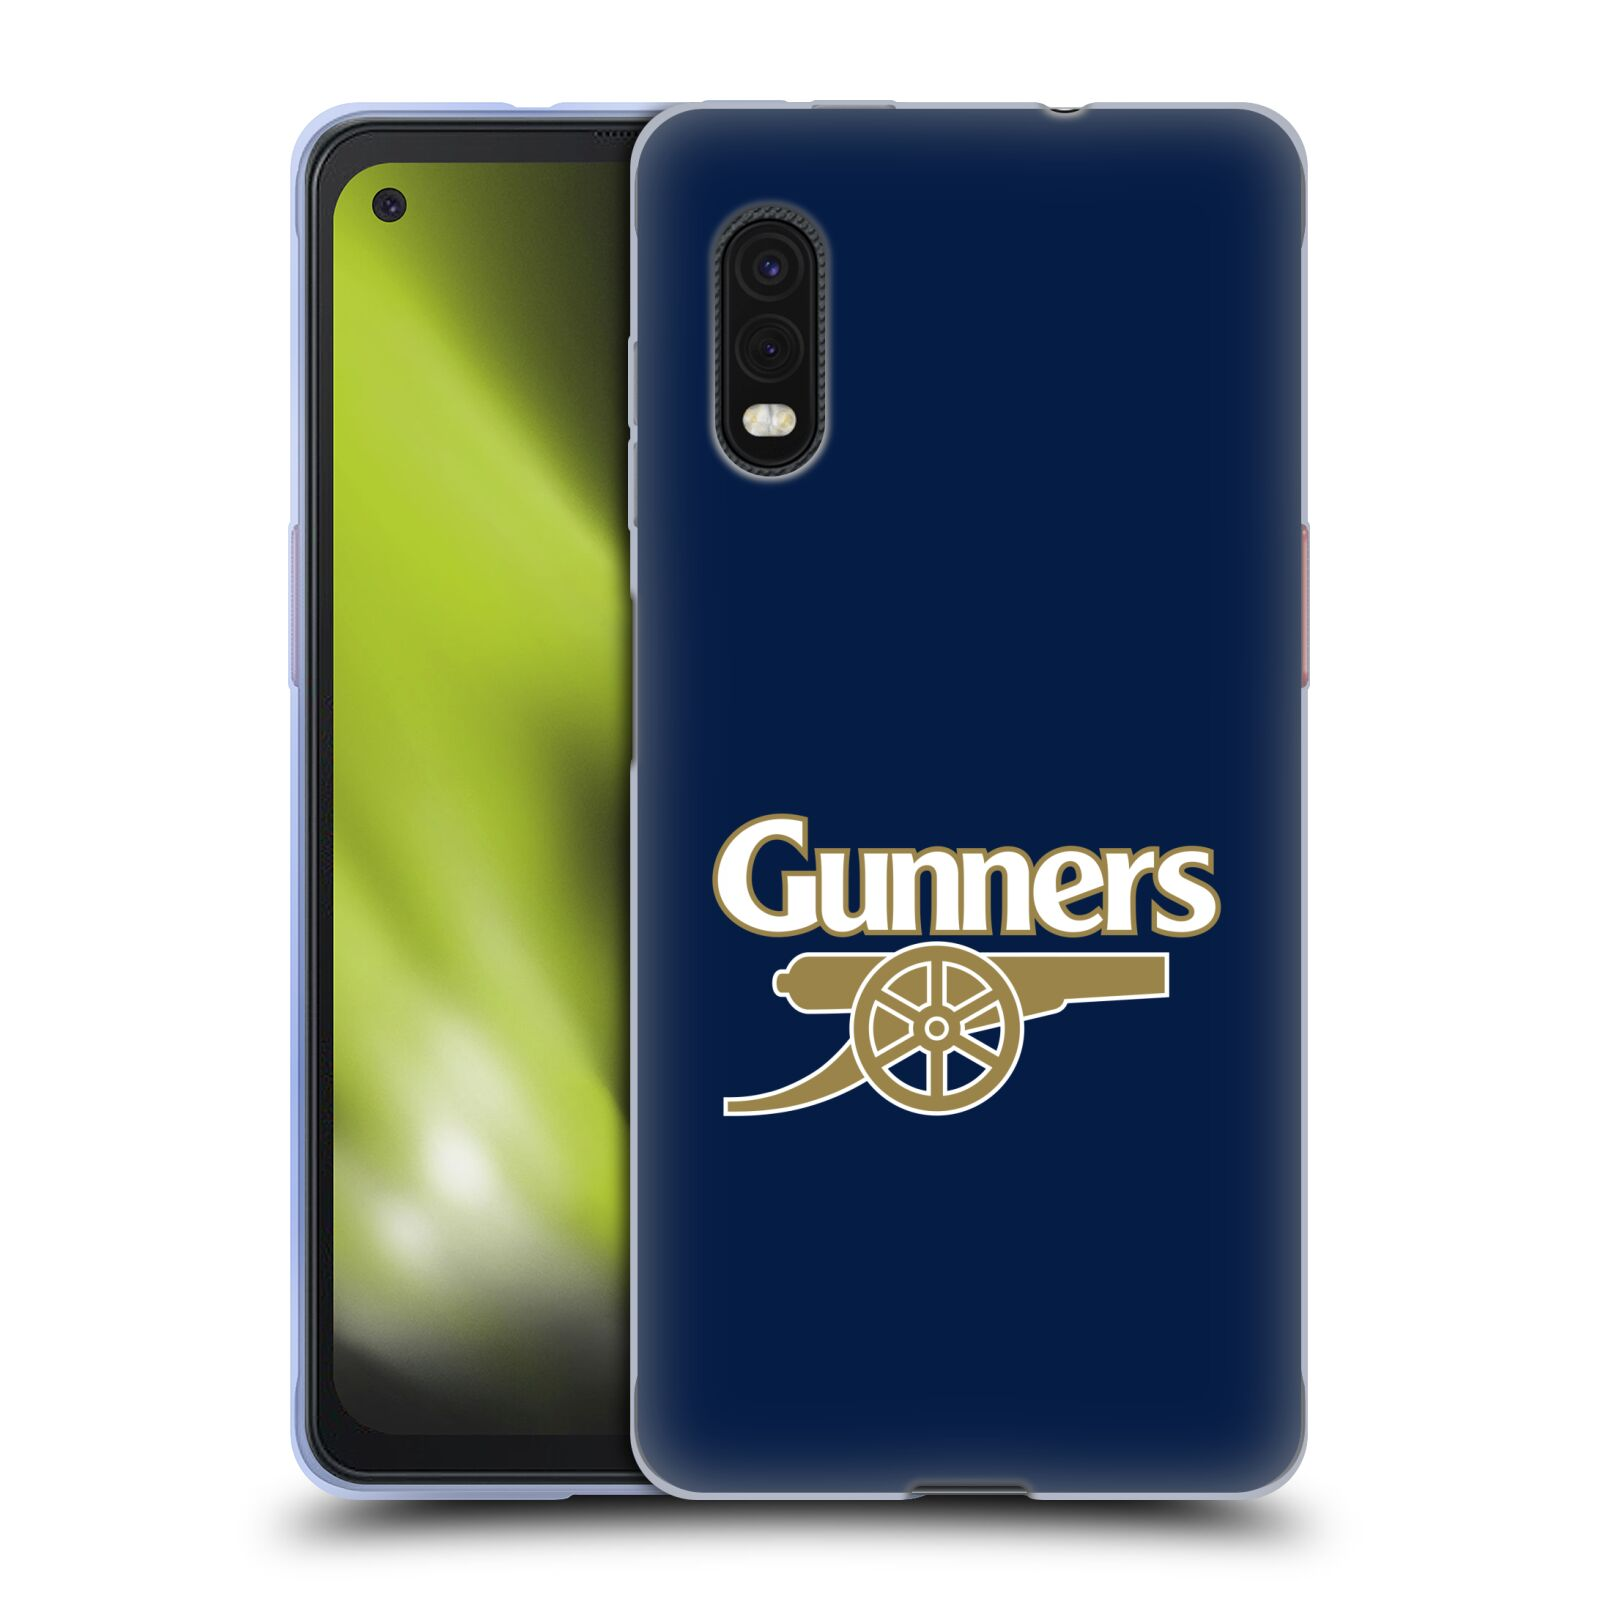 Silikonové pouzdro na mobil Samsung Galaxy Xcover Pro - Head Case - Arsenal FC - Gunners